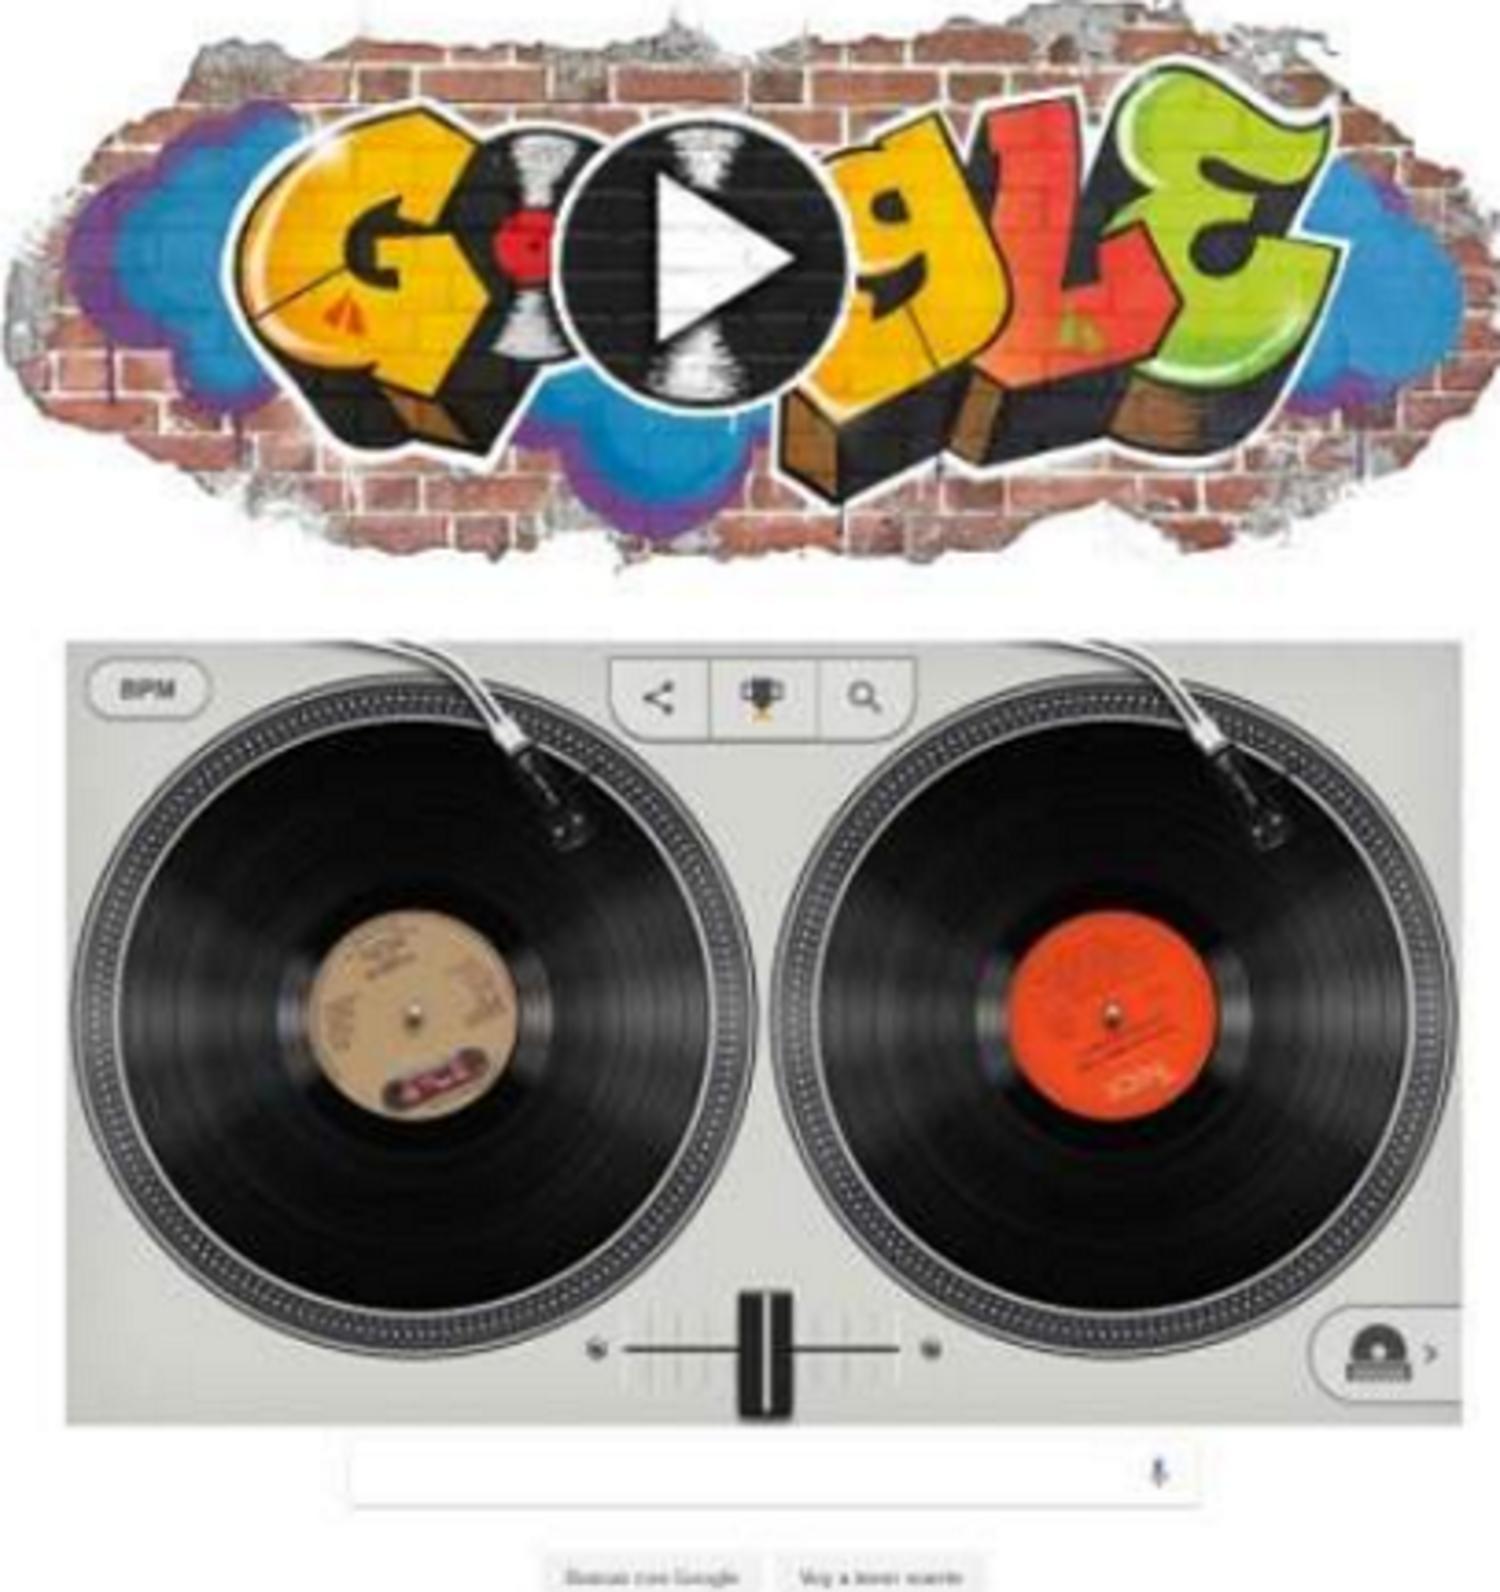 Google Doodle, August 11th, 2017